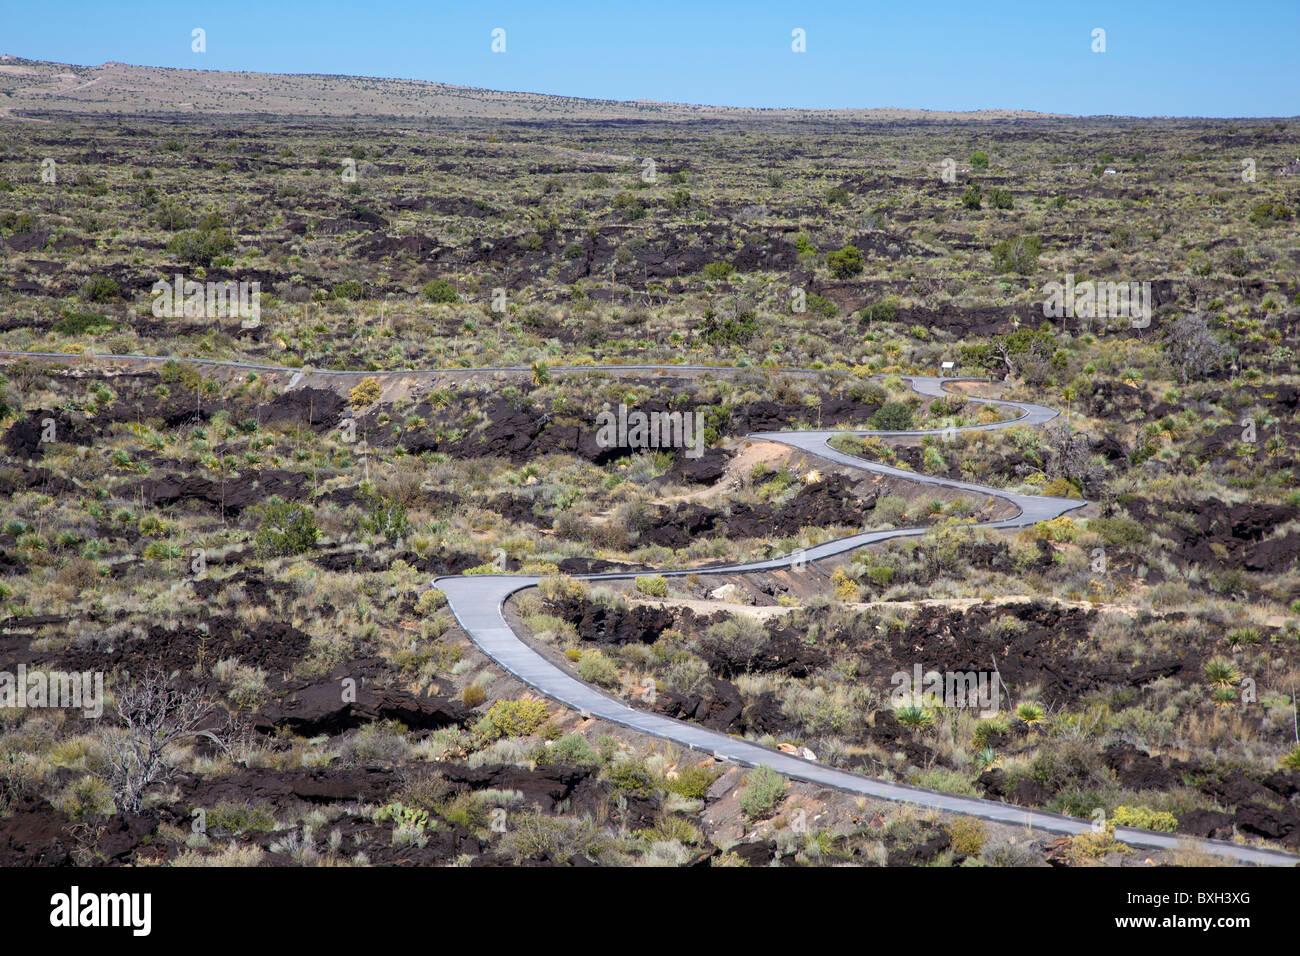 Malpais Lava Flow - Stock Image